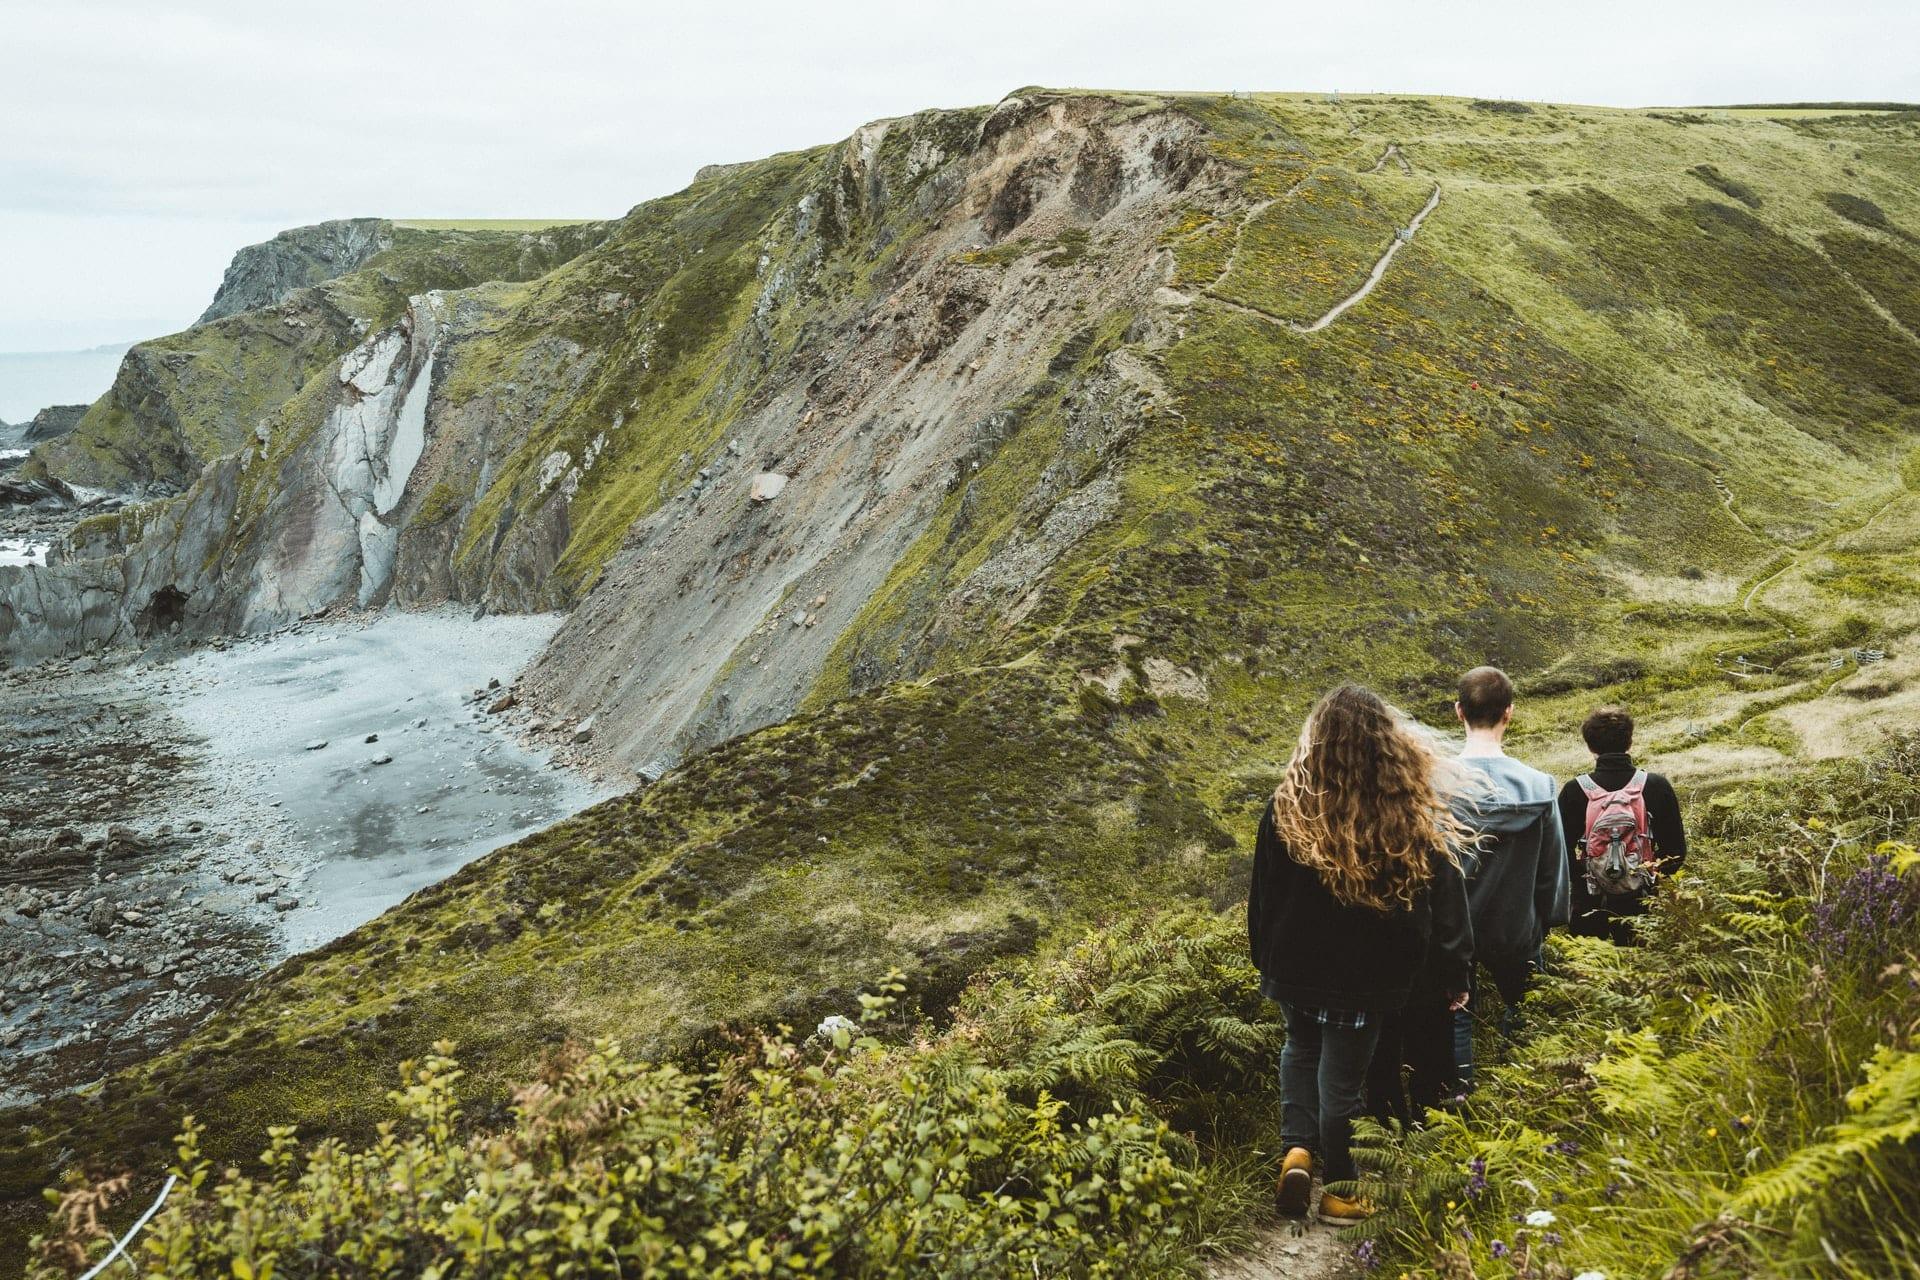 friends-walking-amid-greenery-along-coastal-cliffs-atlantic-highway-cornwall